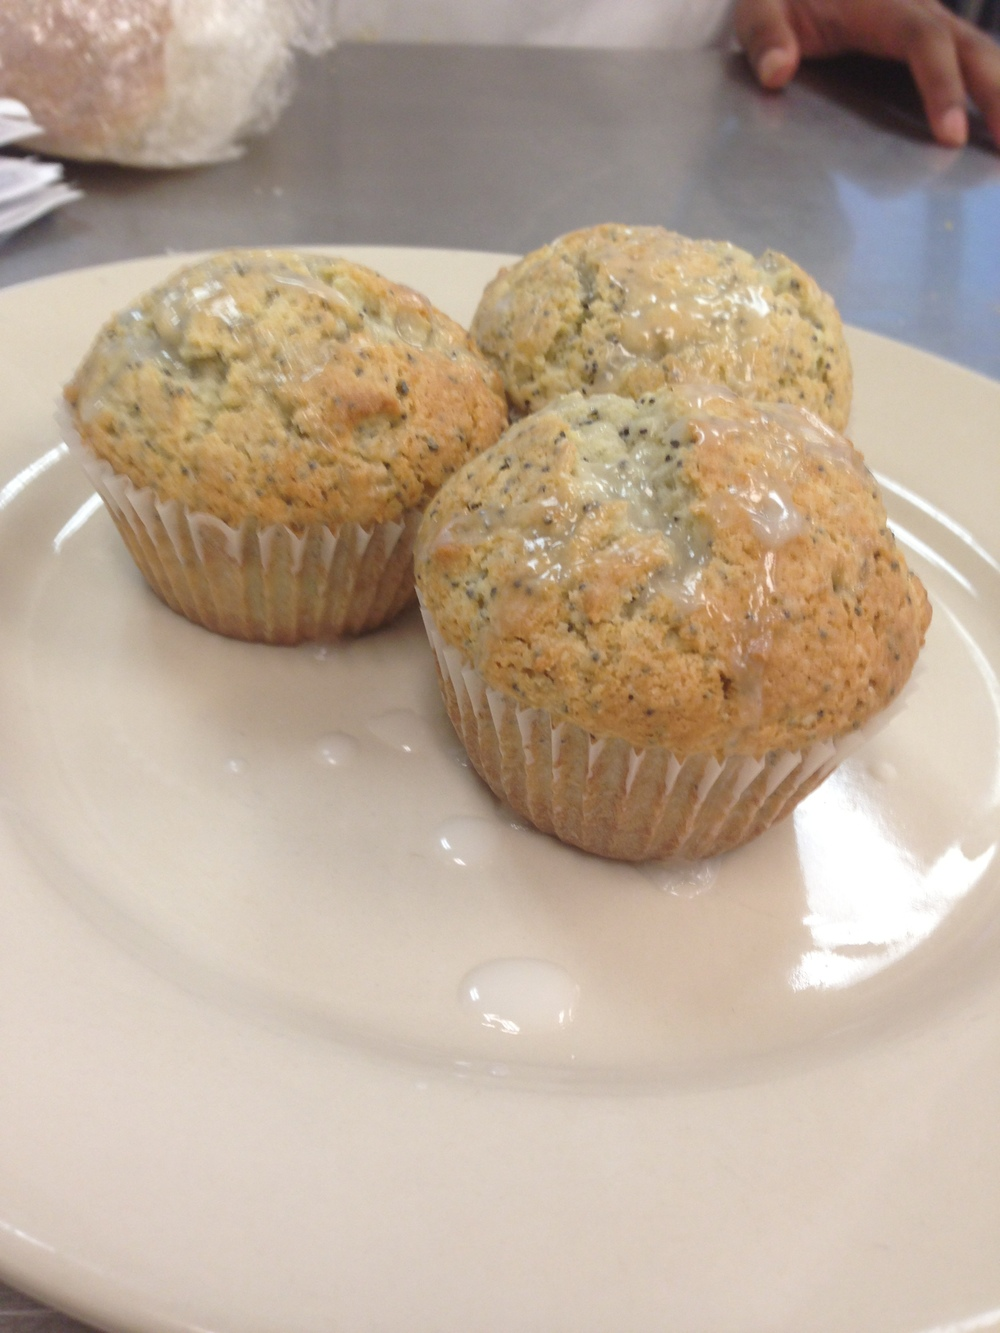 Lemon poppy seed muffins with a lemon glaze